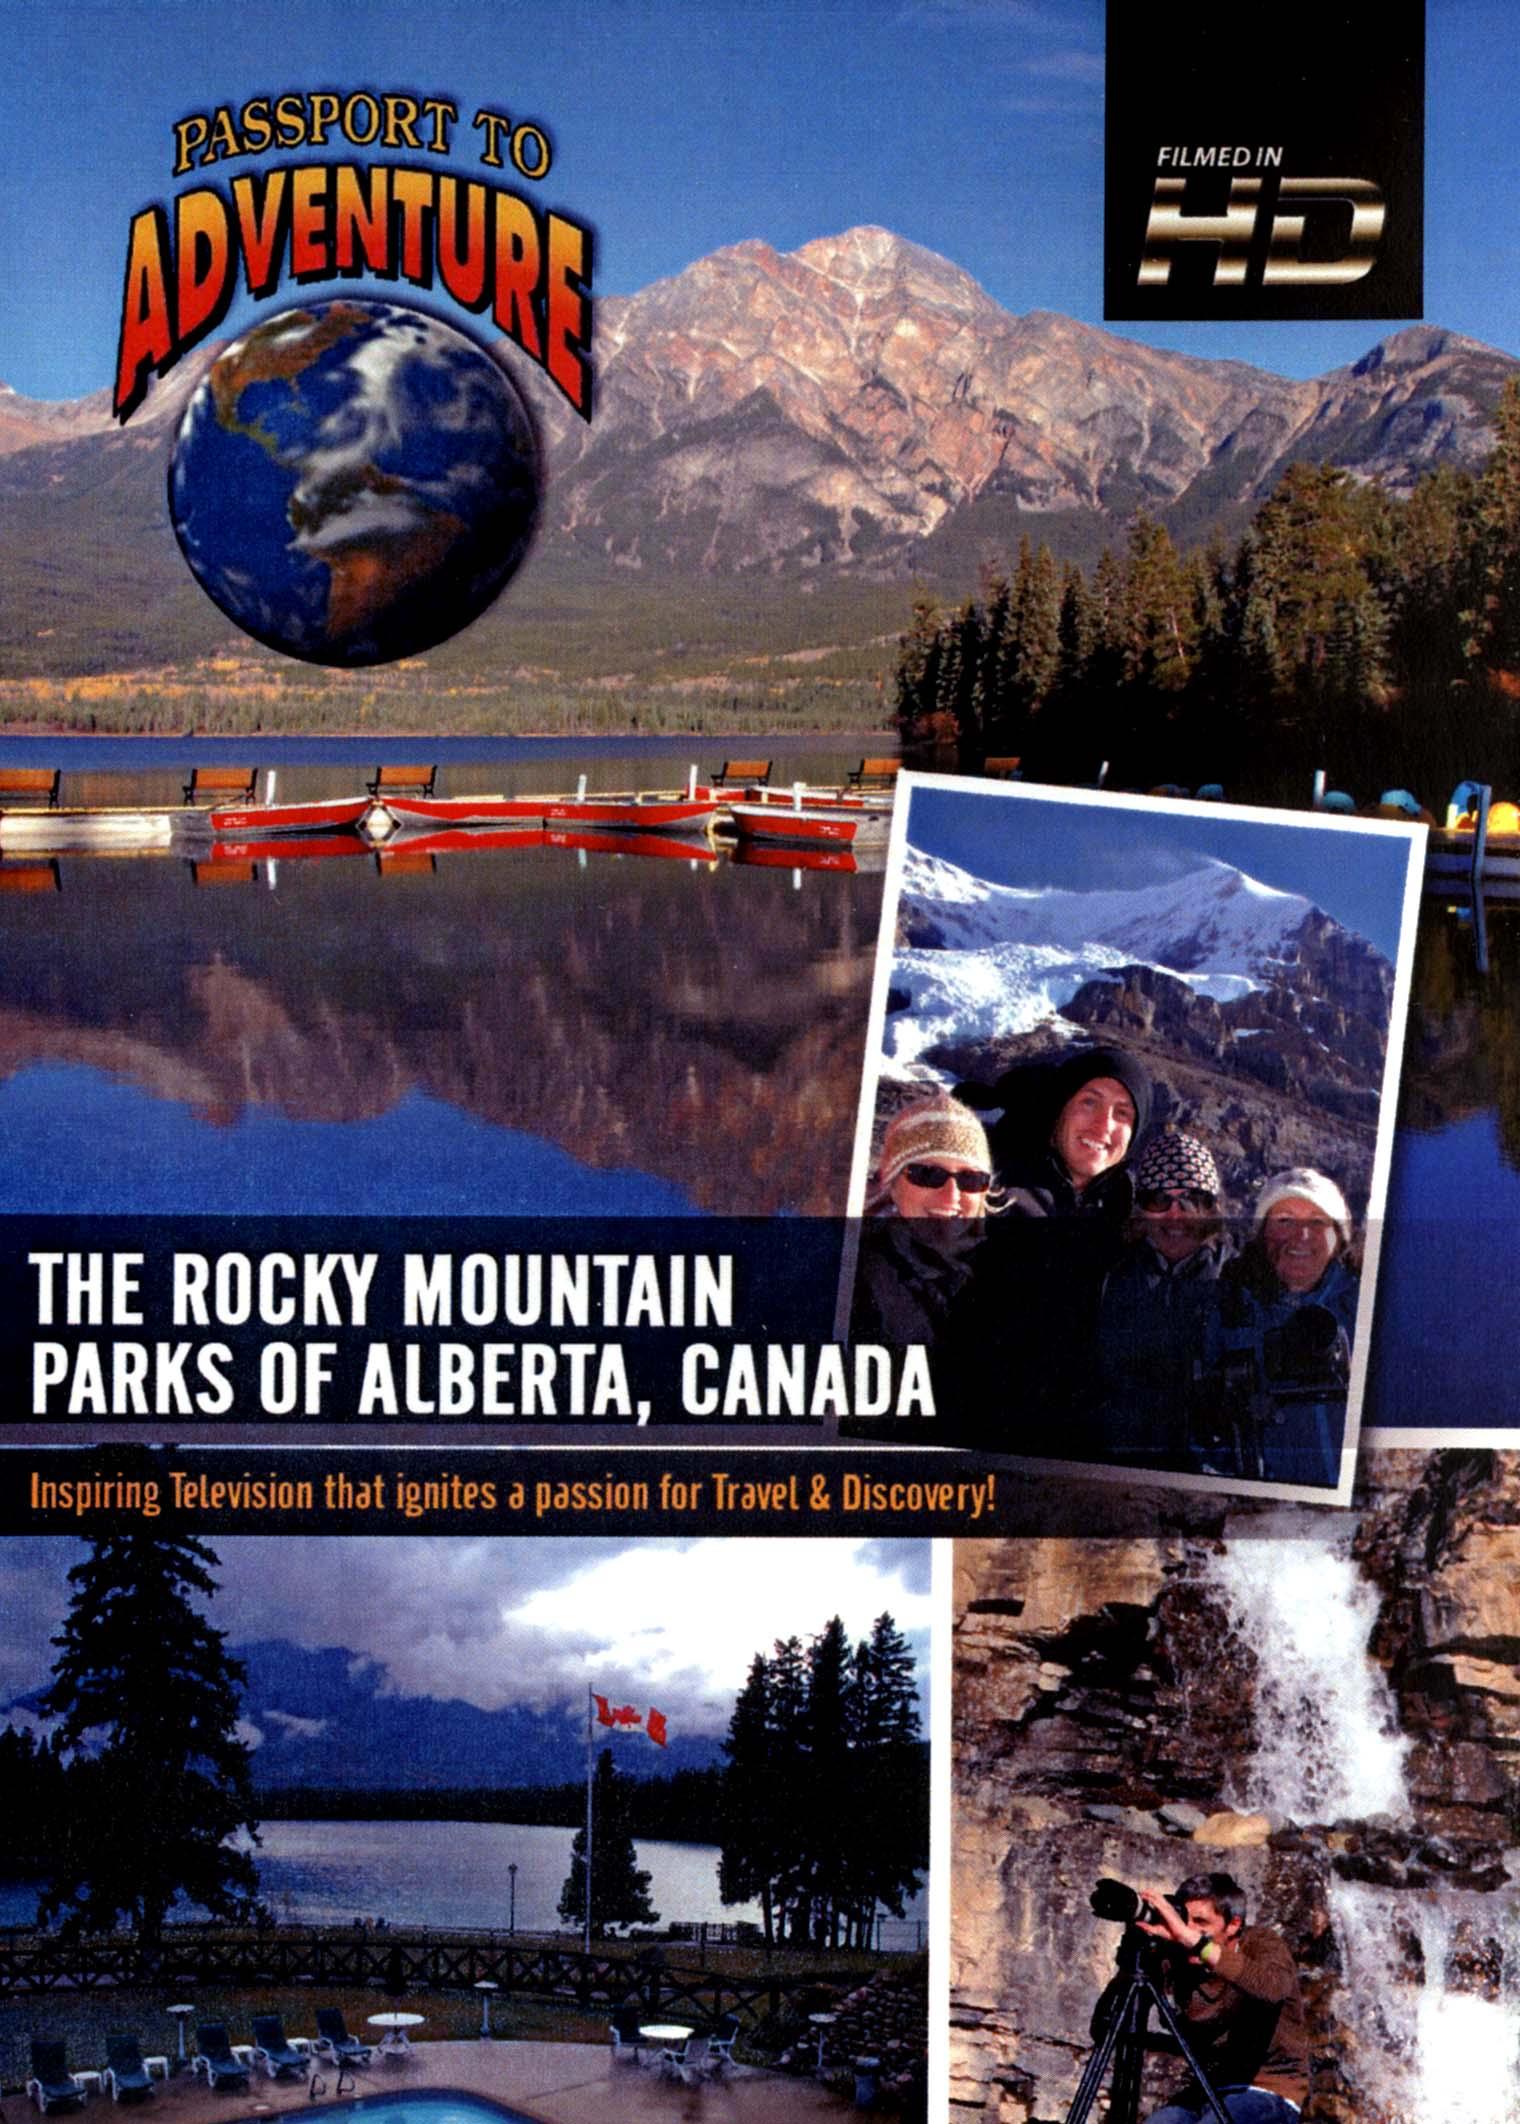 Passport to Adventure: The Rocky Mountain Parks of Alberta, Canada